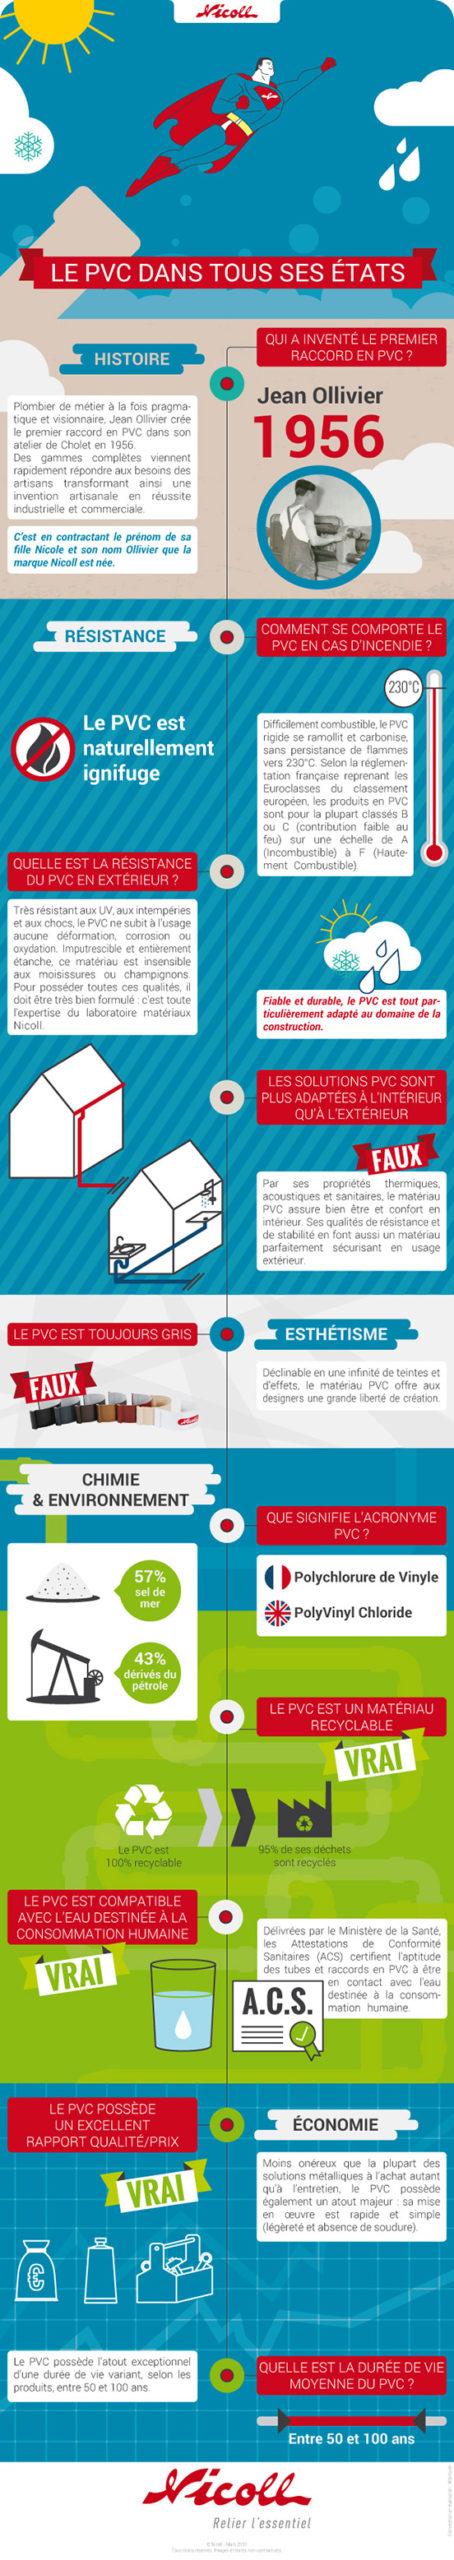 infographie-nicoll-wordside-jordan-gentes